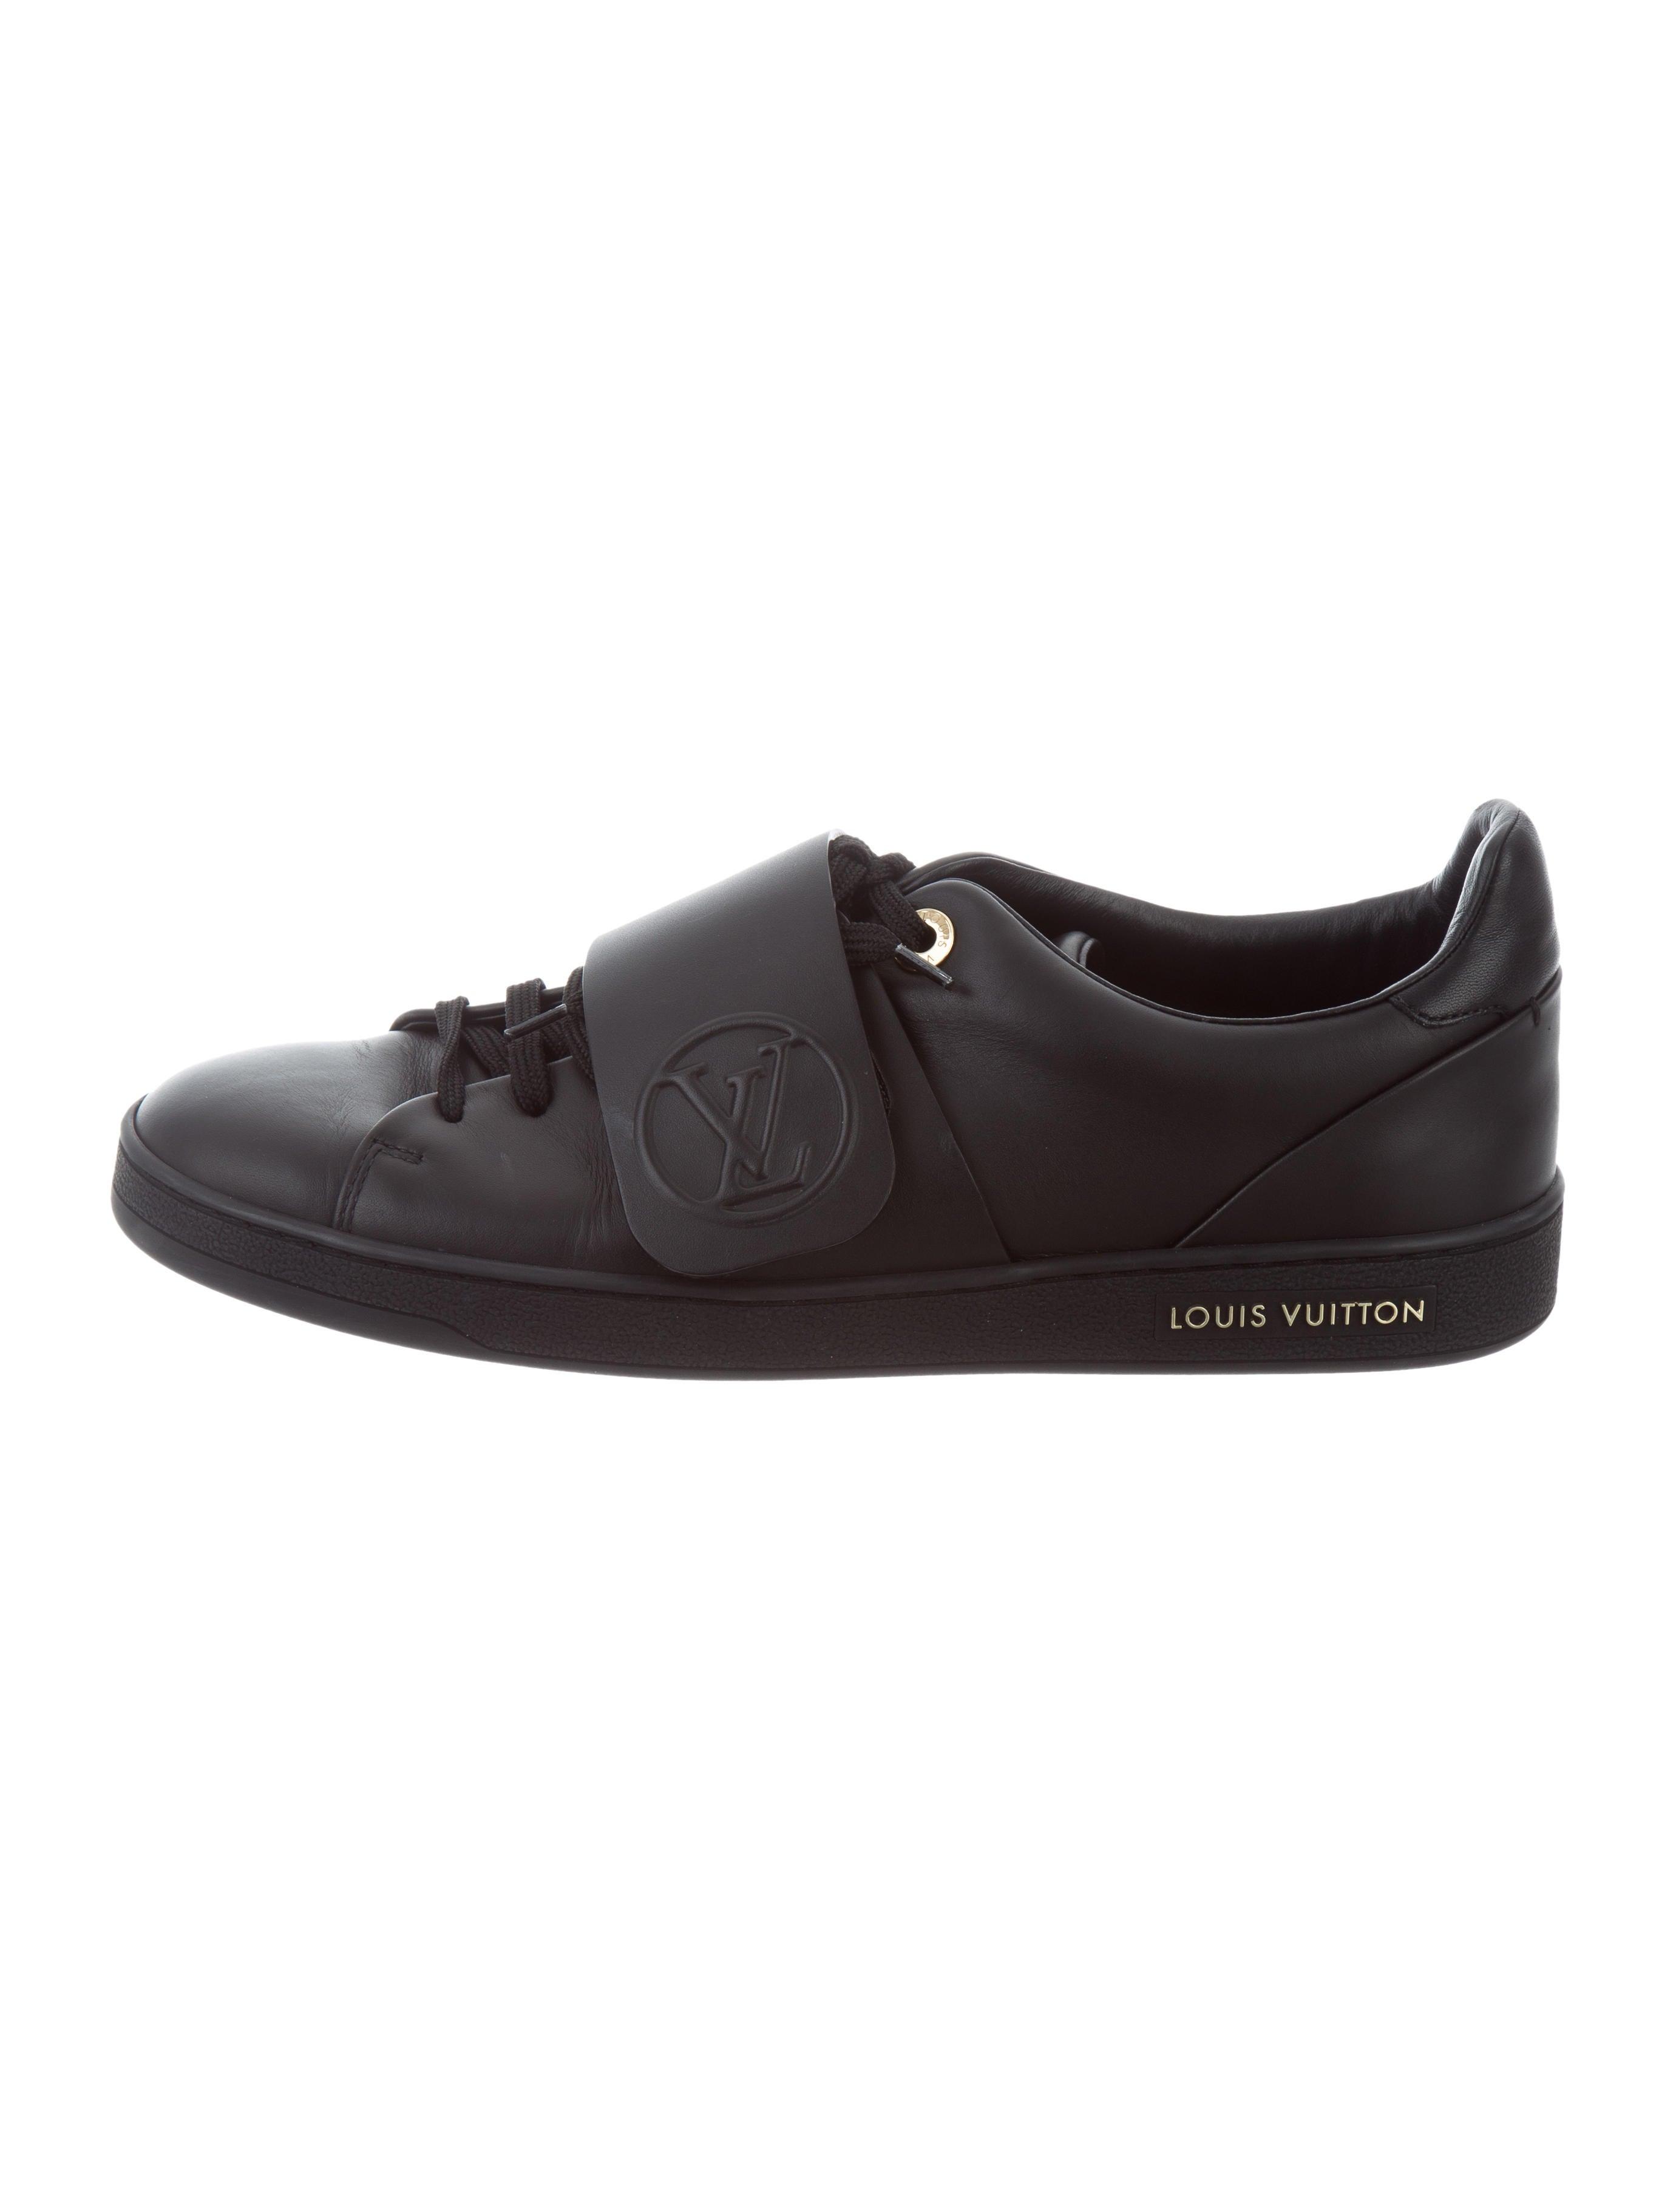 59e8ba246260 Louis Vuitton Front Row Sneakers - Shoes - LOU135509